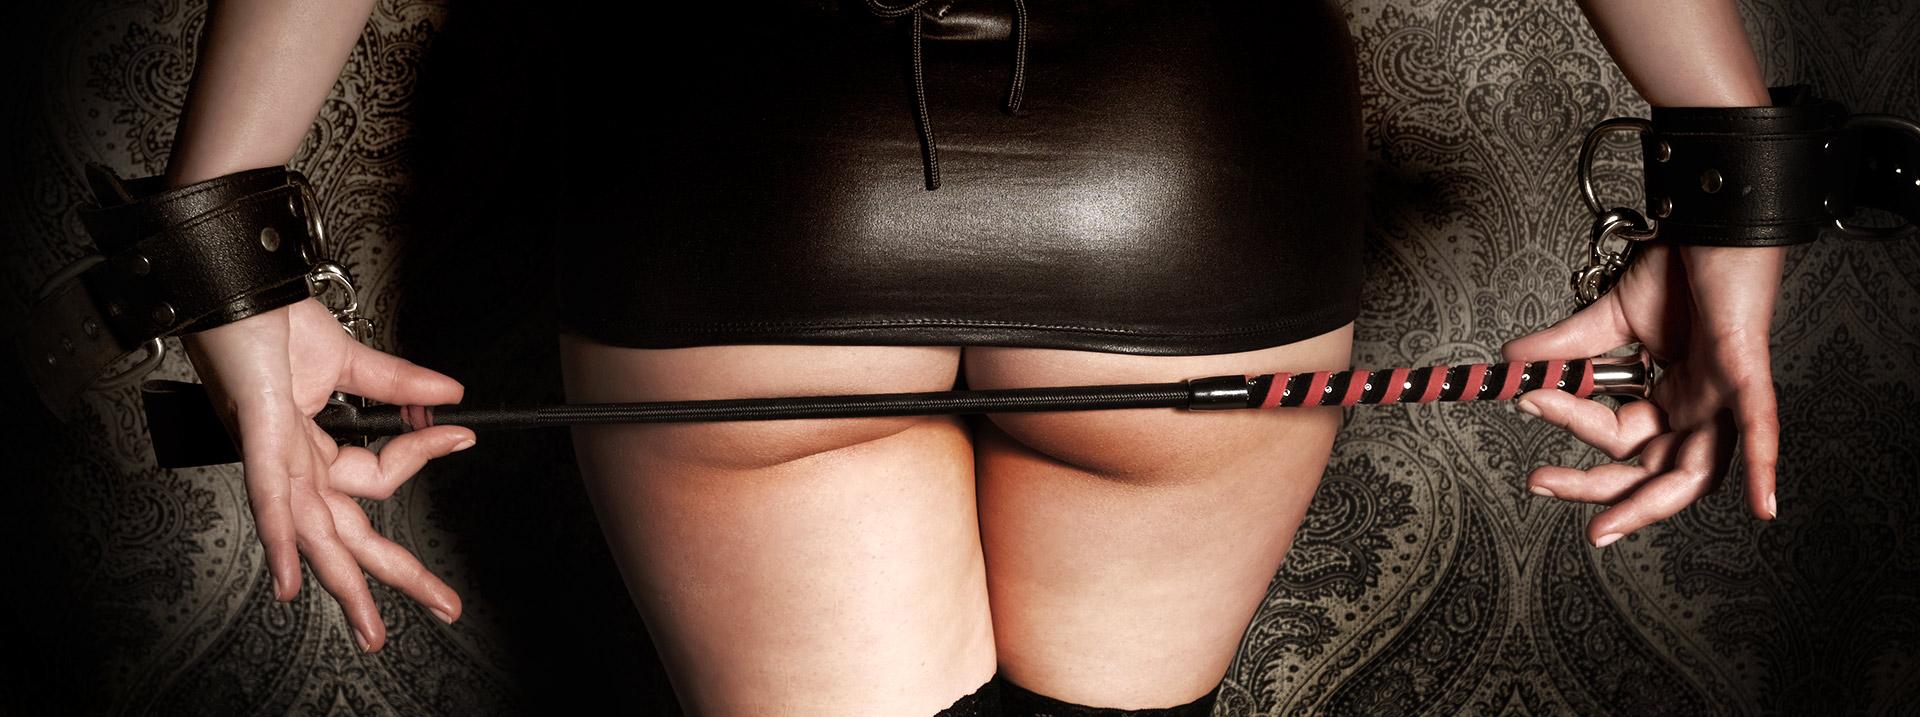 fetish-boudoir-photography